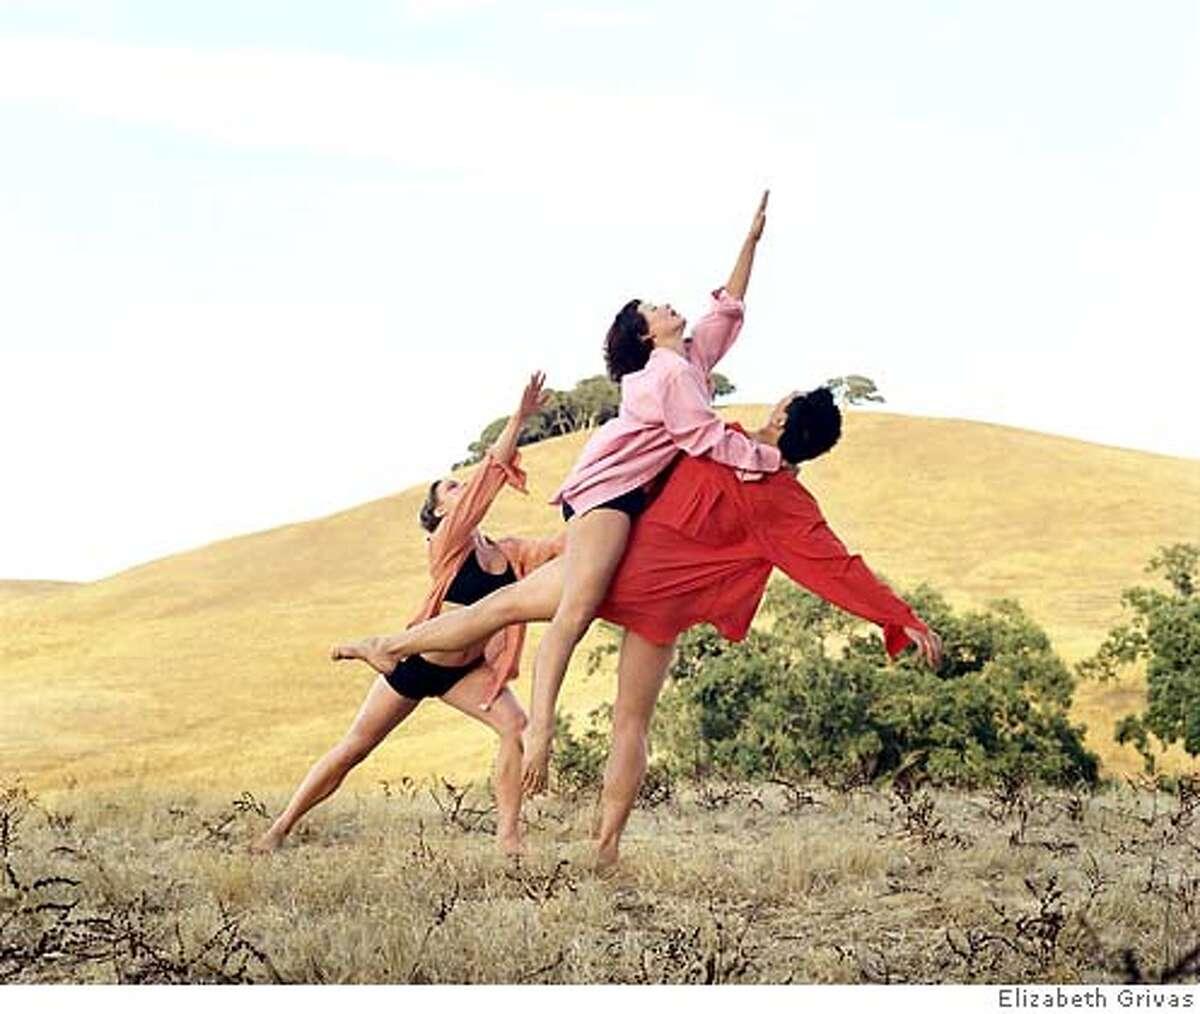 LEVYdance: photo credit: elizabeth grivas (lowercase)